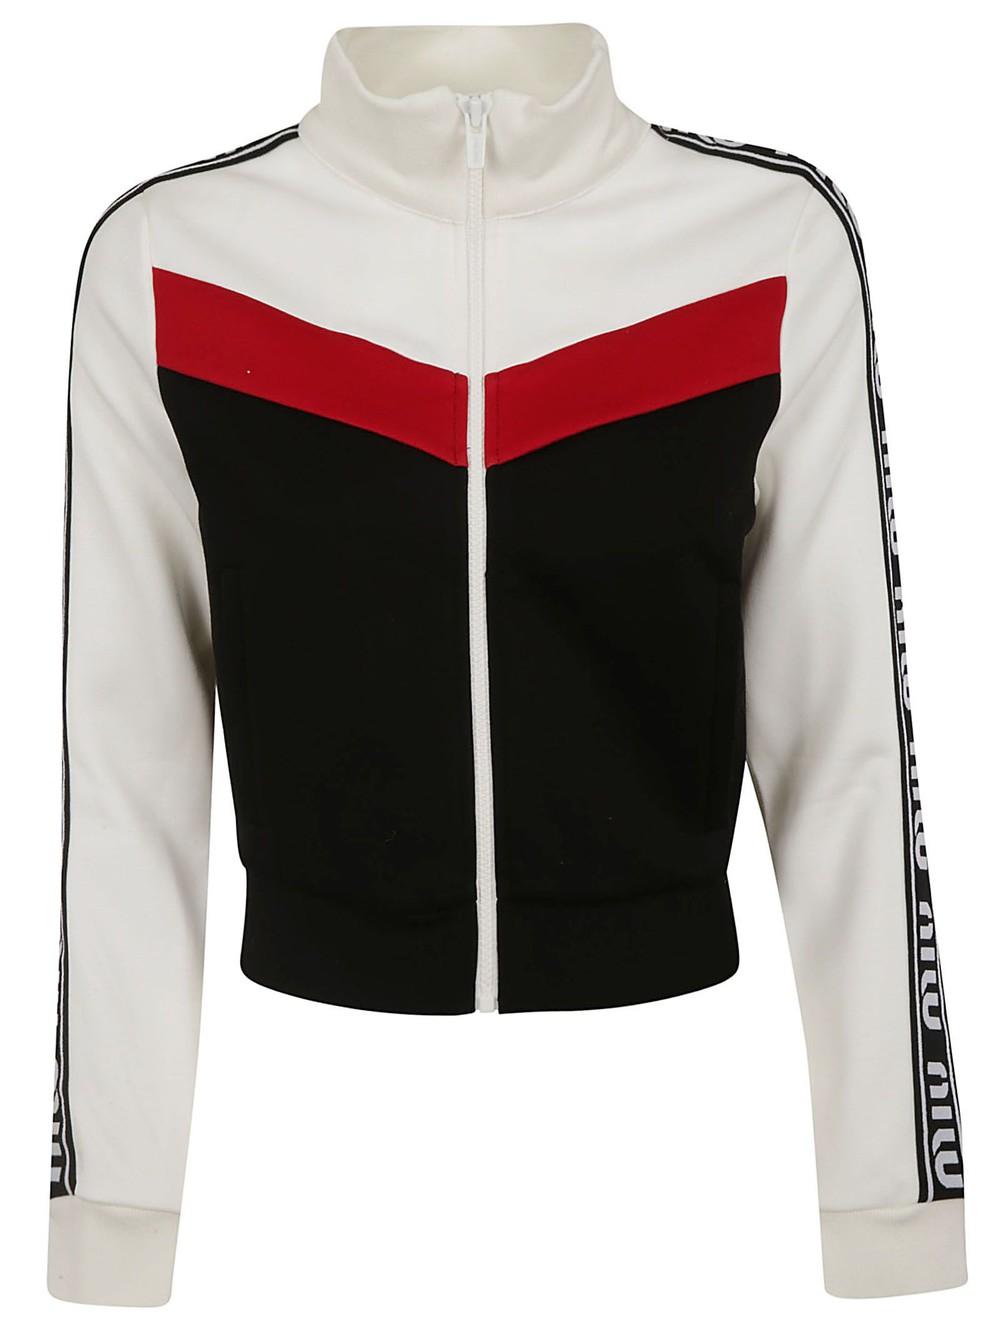 Miu Miu Paneled Jacket in black